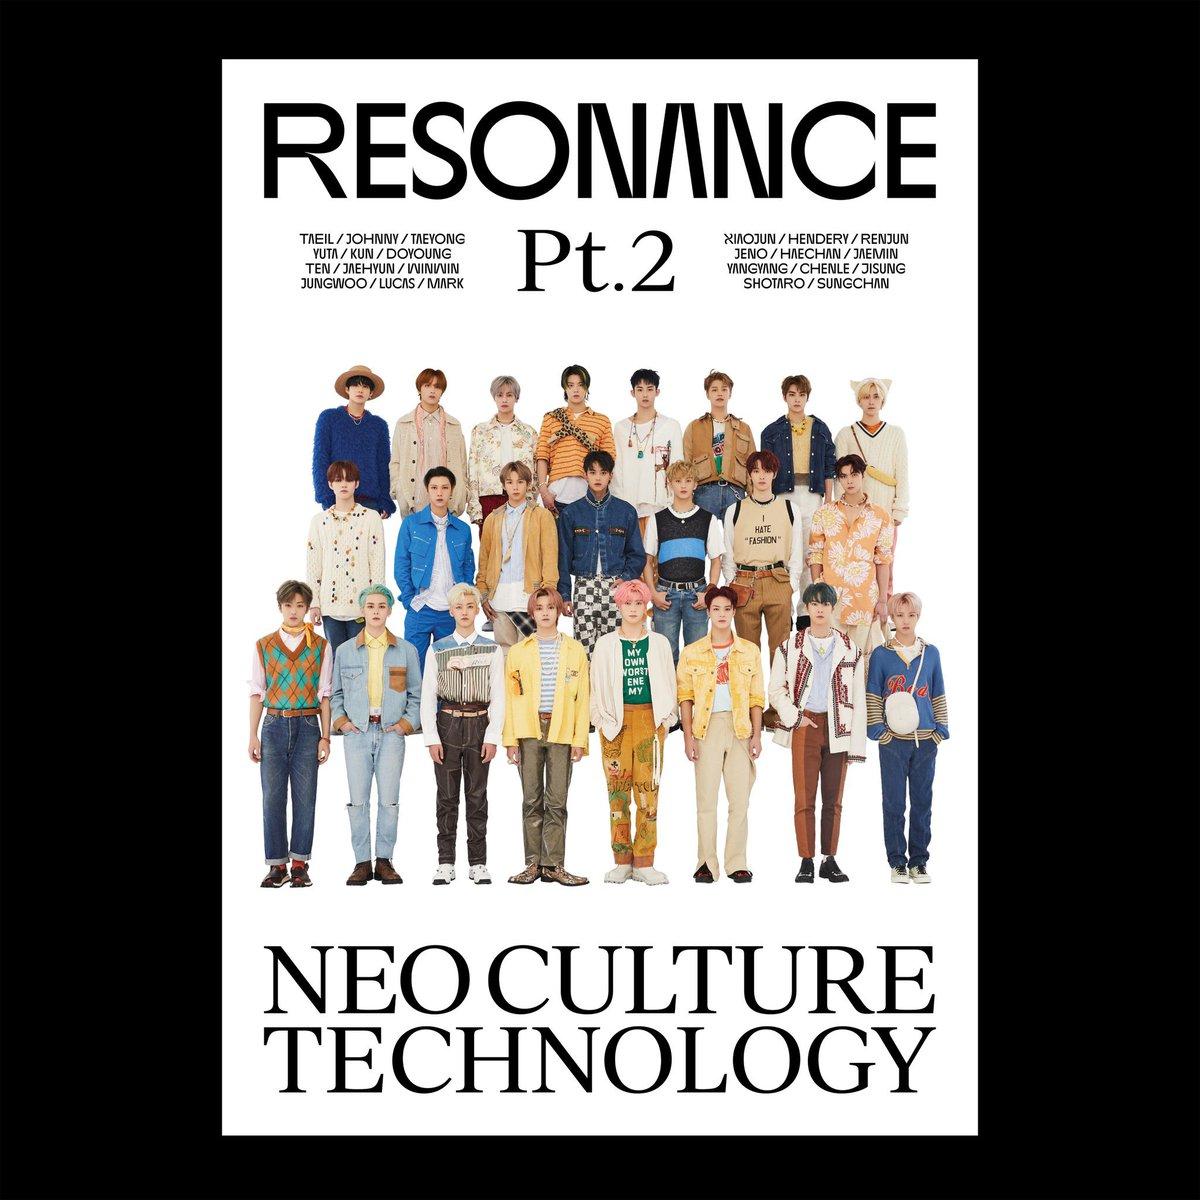 NCT – The 2nd Album RESONANCE Pt.2の発売が決定しました! NCTzen 127-JAPAN  OFFICIAL SHOP & mu-moショップでは特別な特典をご用意!  詳しくはこちら▼ pre.nct-jp.net/news/detail.ph…  #NCT #NCT2020 #NCT_RESONANCE #RESONANCE_Pt2